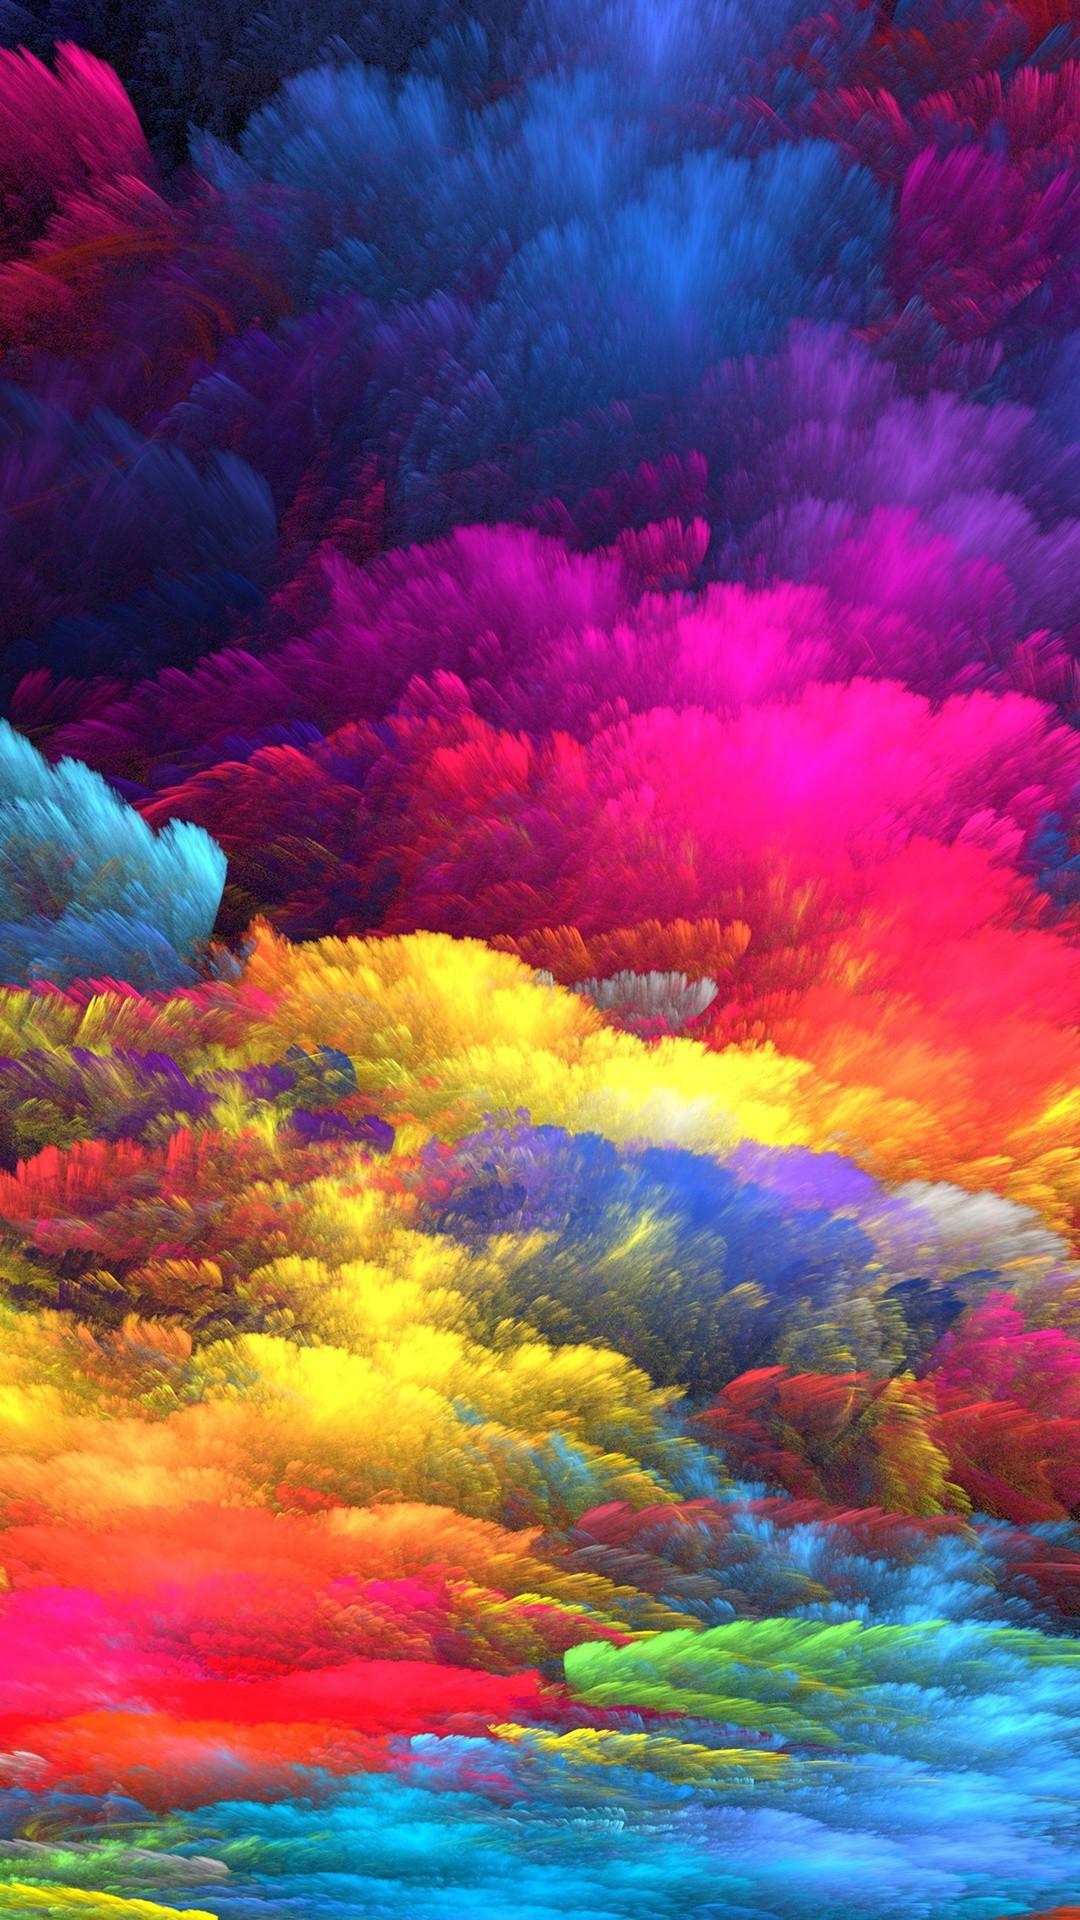 Color explosion wallpaper 77 images - Beautiful nature wallpaper zedge ...